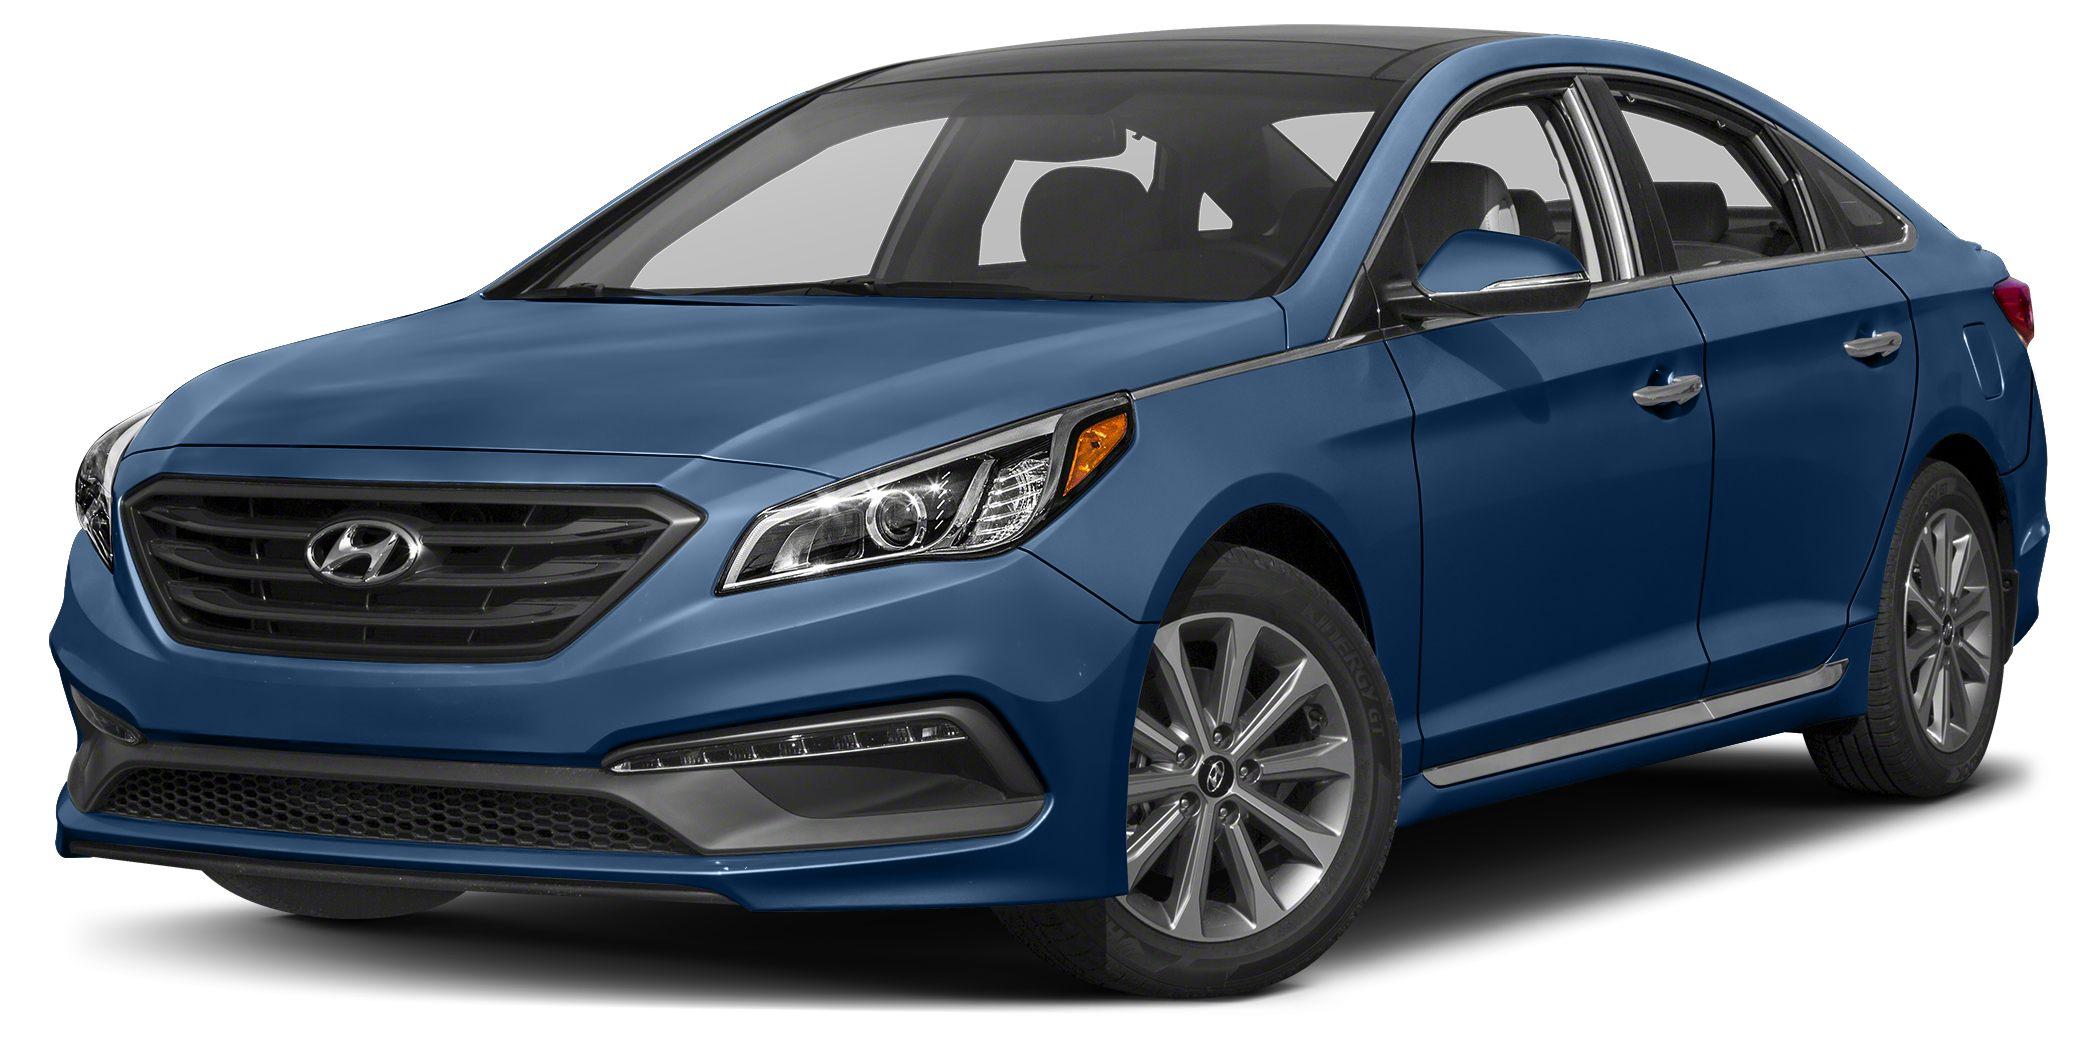 2016 Hyundai Sonata Limited Bluetooth Miles 11Color Lakeside Blue Stock 14649 VIN 5NPE34AF6